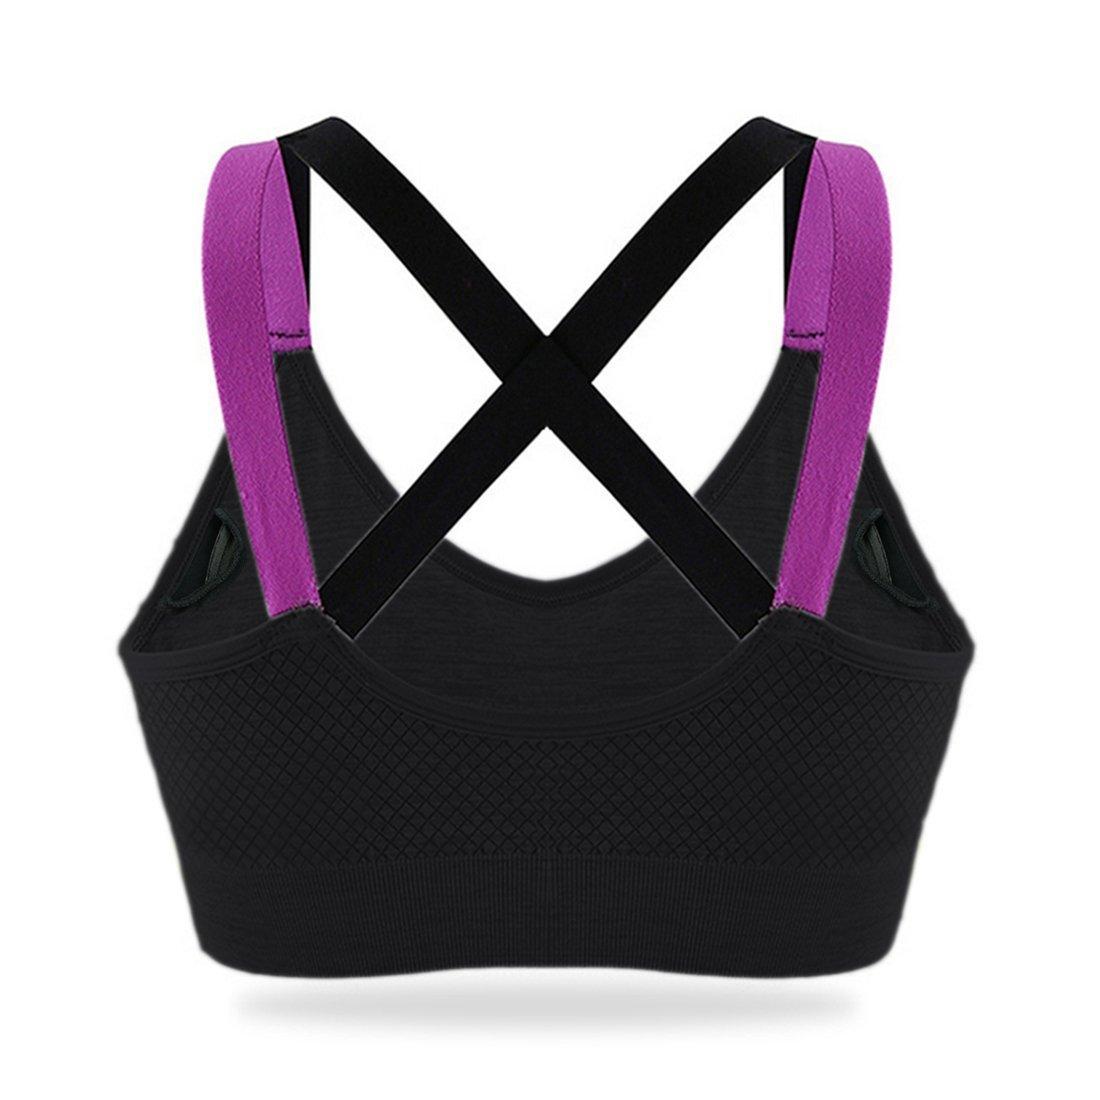 Women Sports Bra Racerback Pad Bra Ladies High Impact Running Yoga Boxing Fitness Strappy Bra